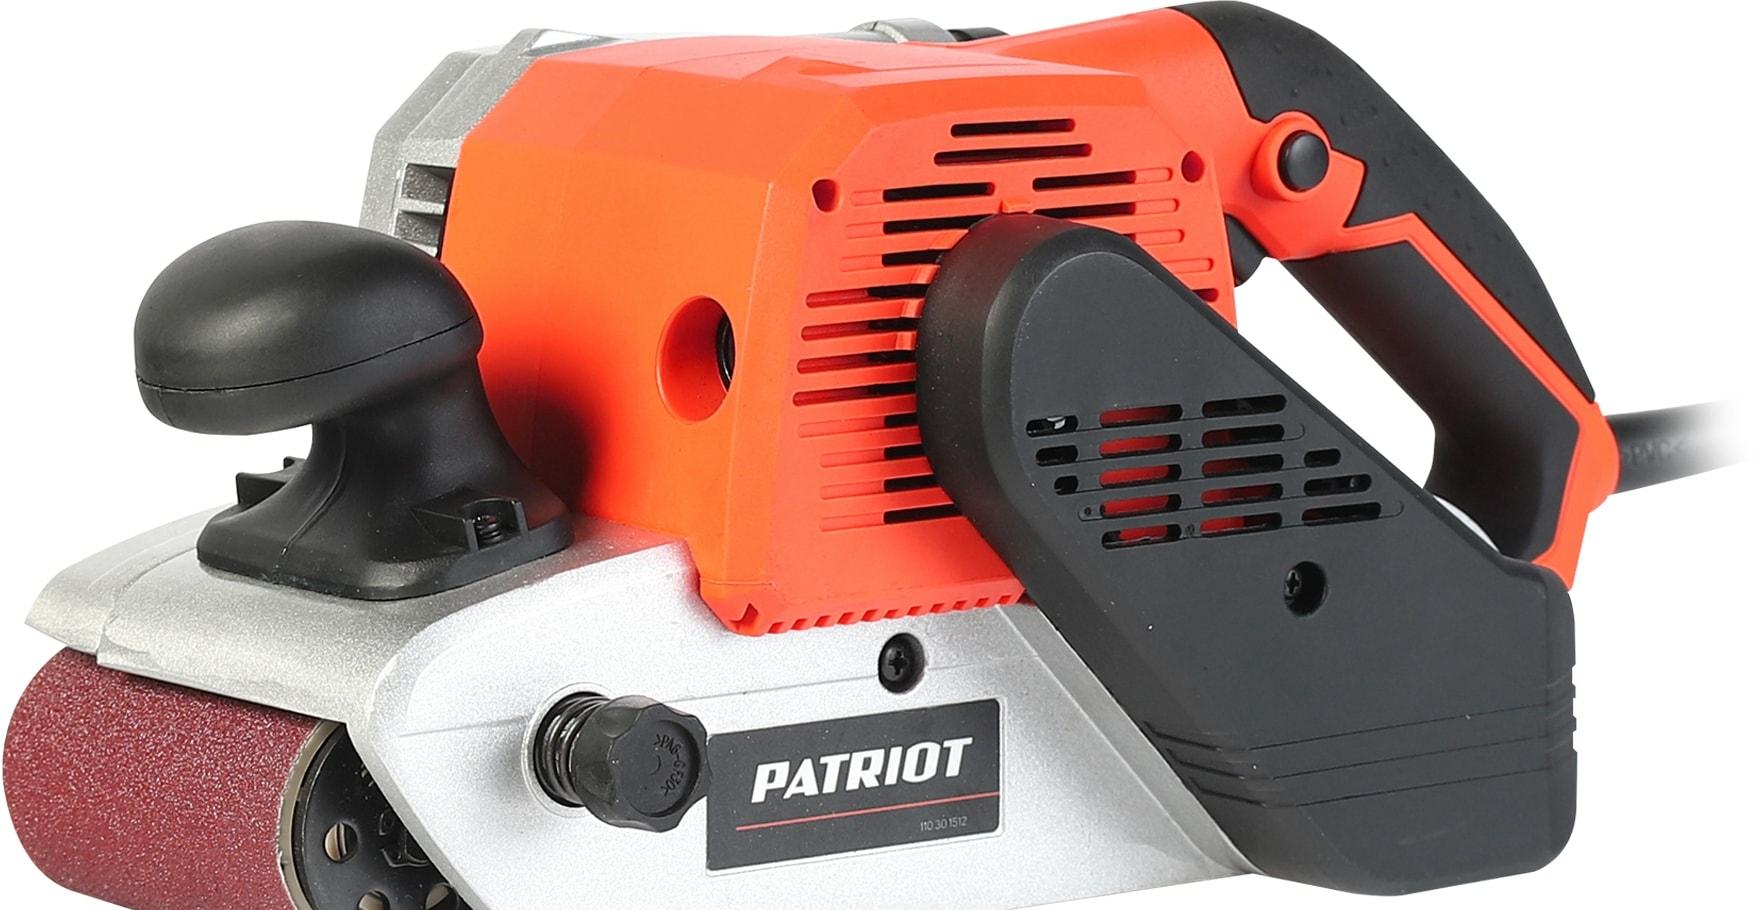 Ленточная шлифмашина Patriot BS 120